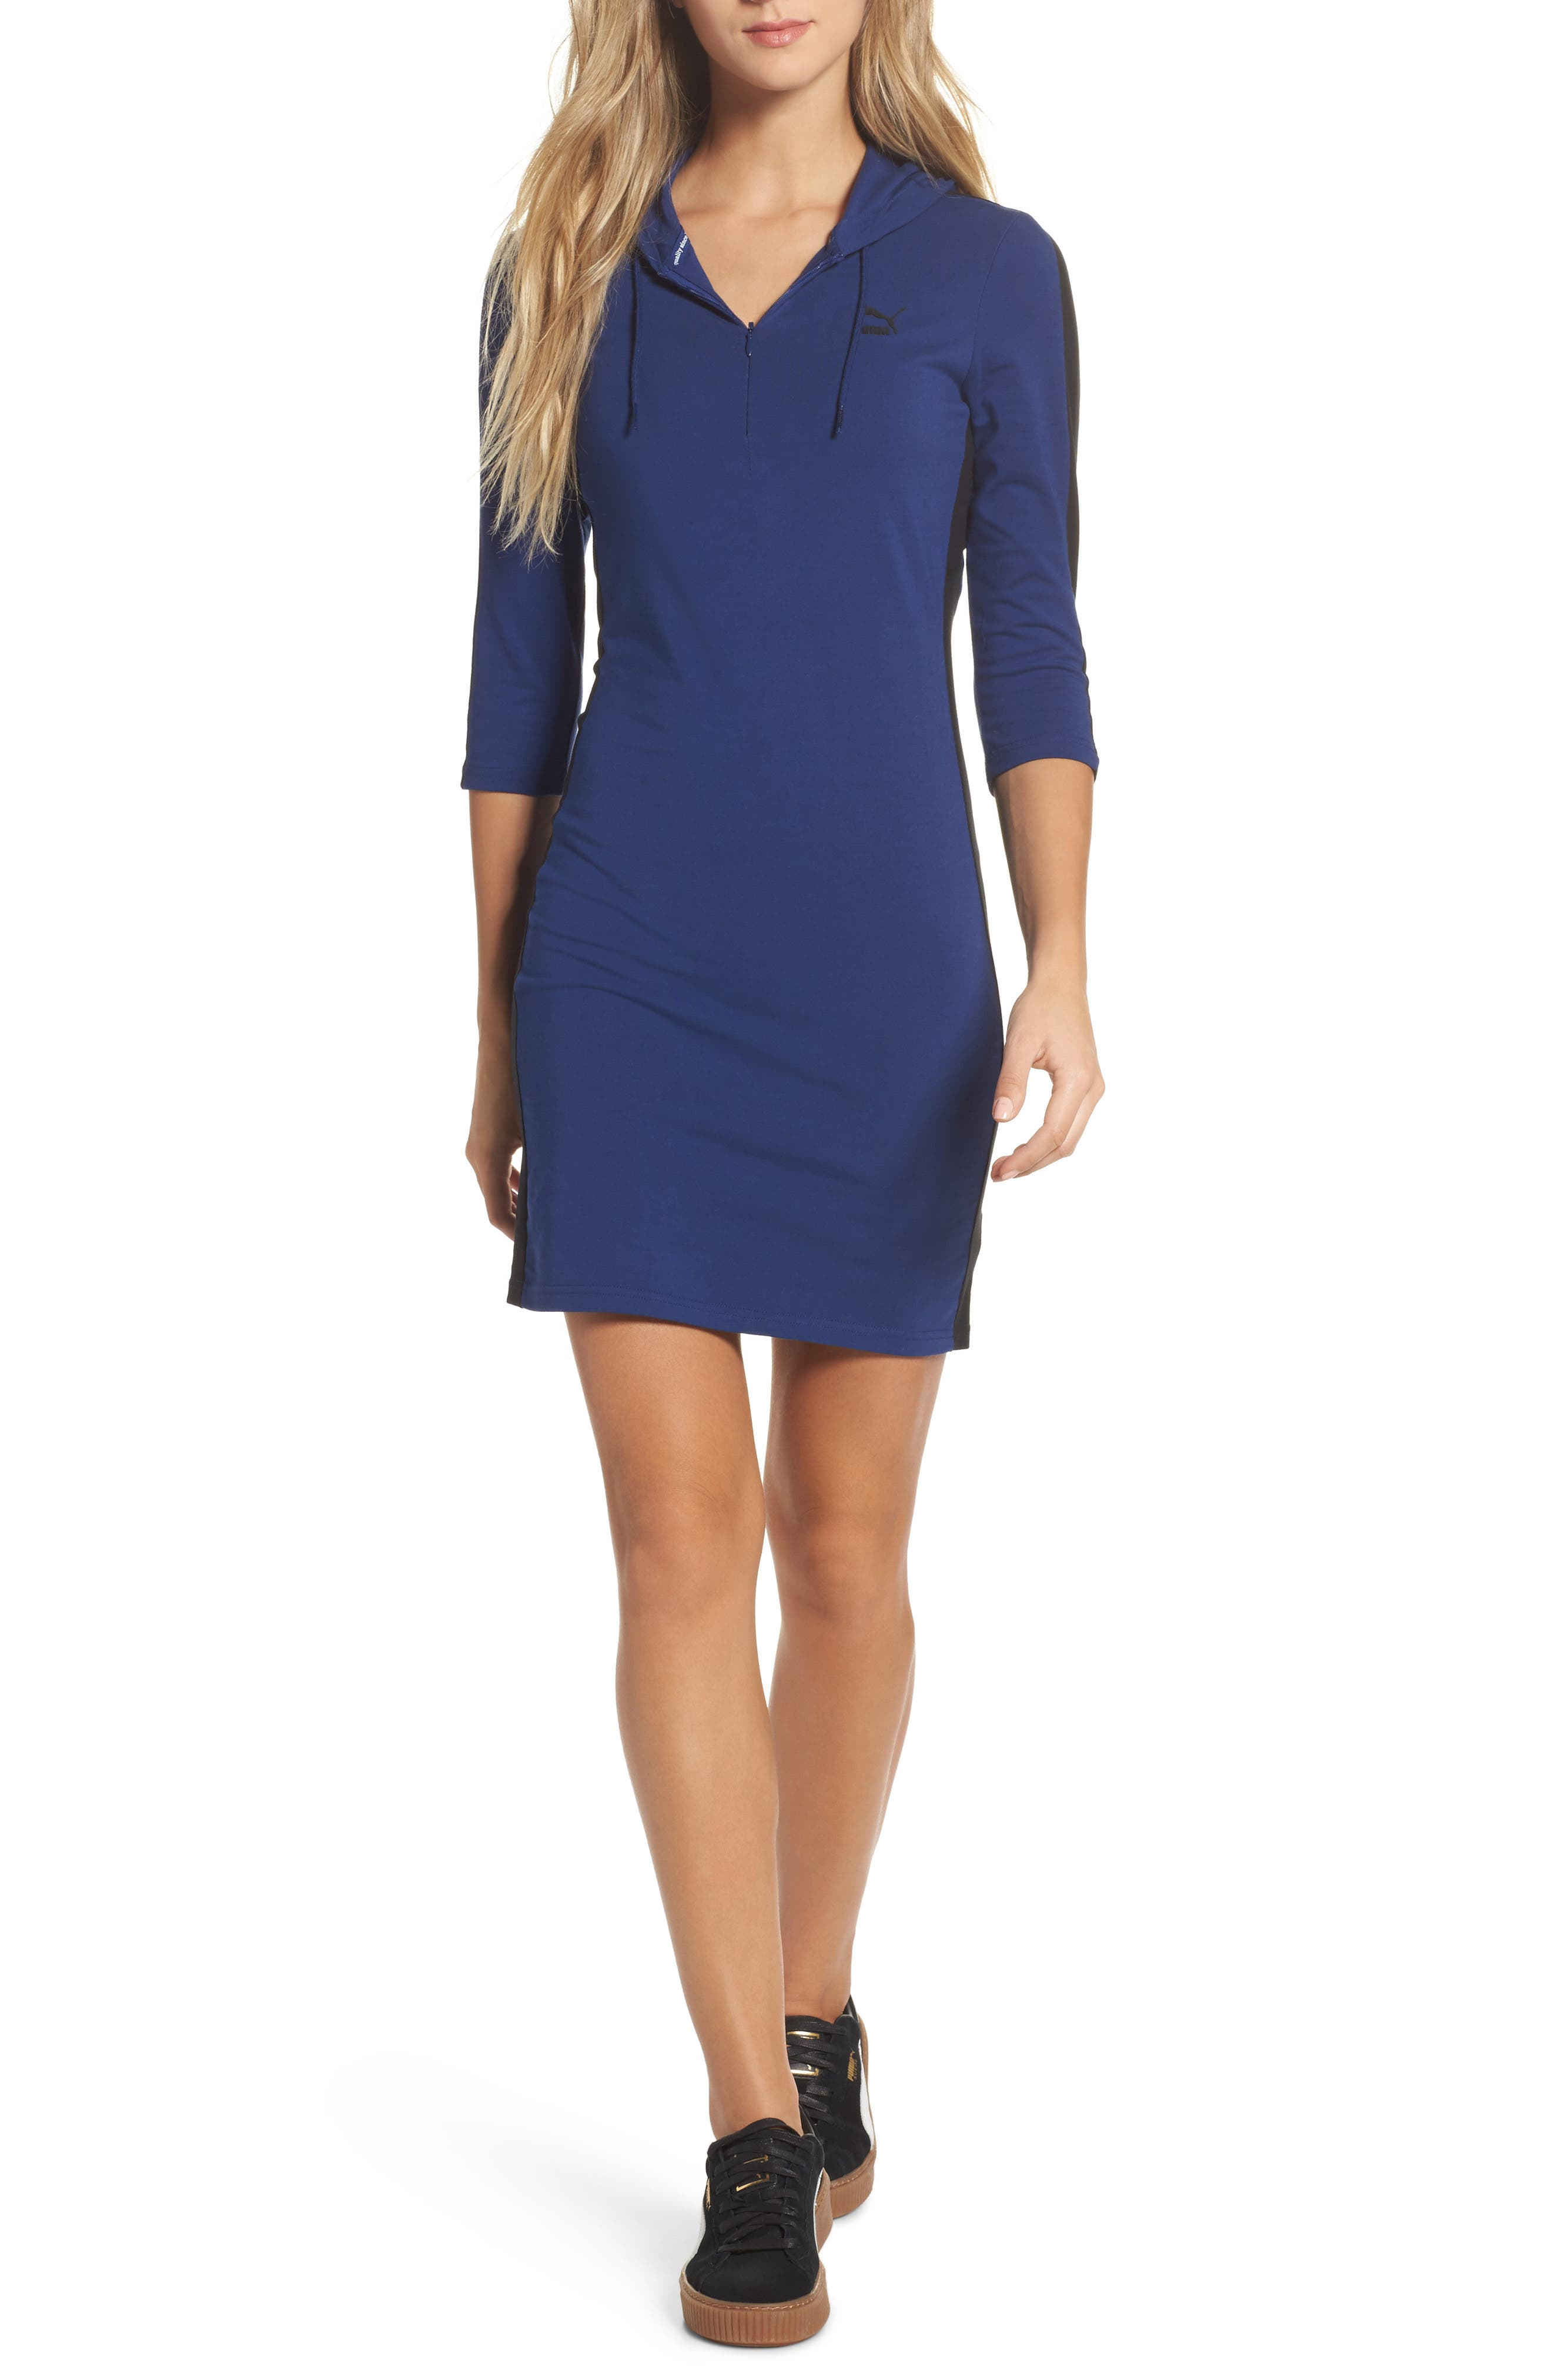 T7 Sweatshirt Dress,                             Main thumbnail 1, color,                             Blue Depths